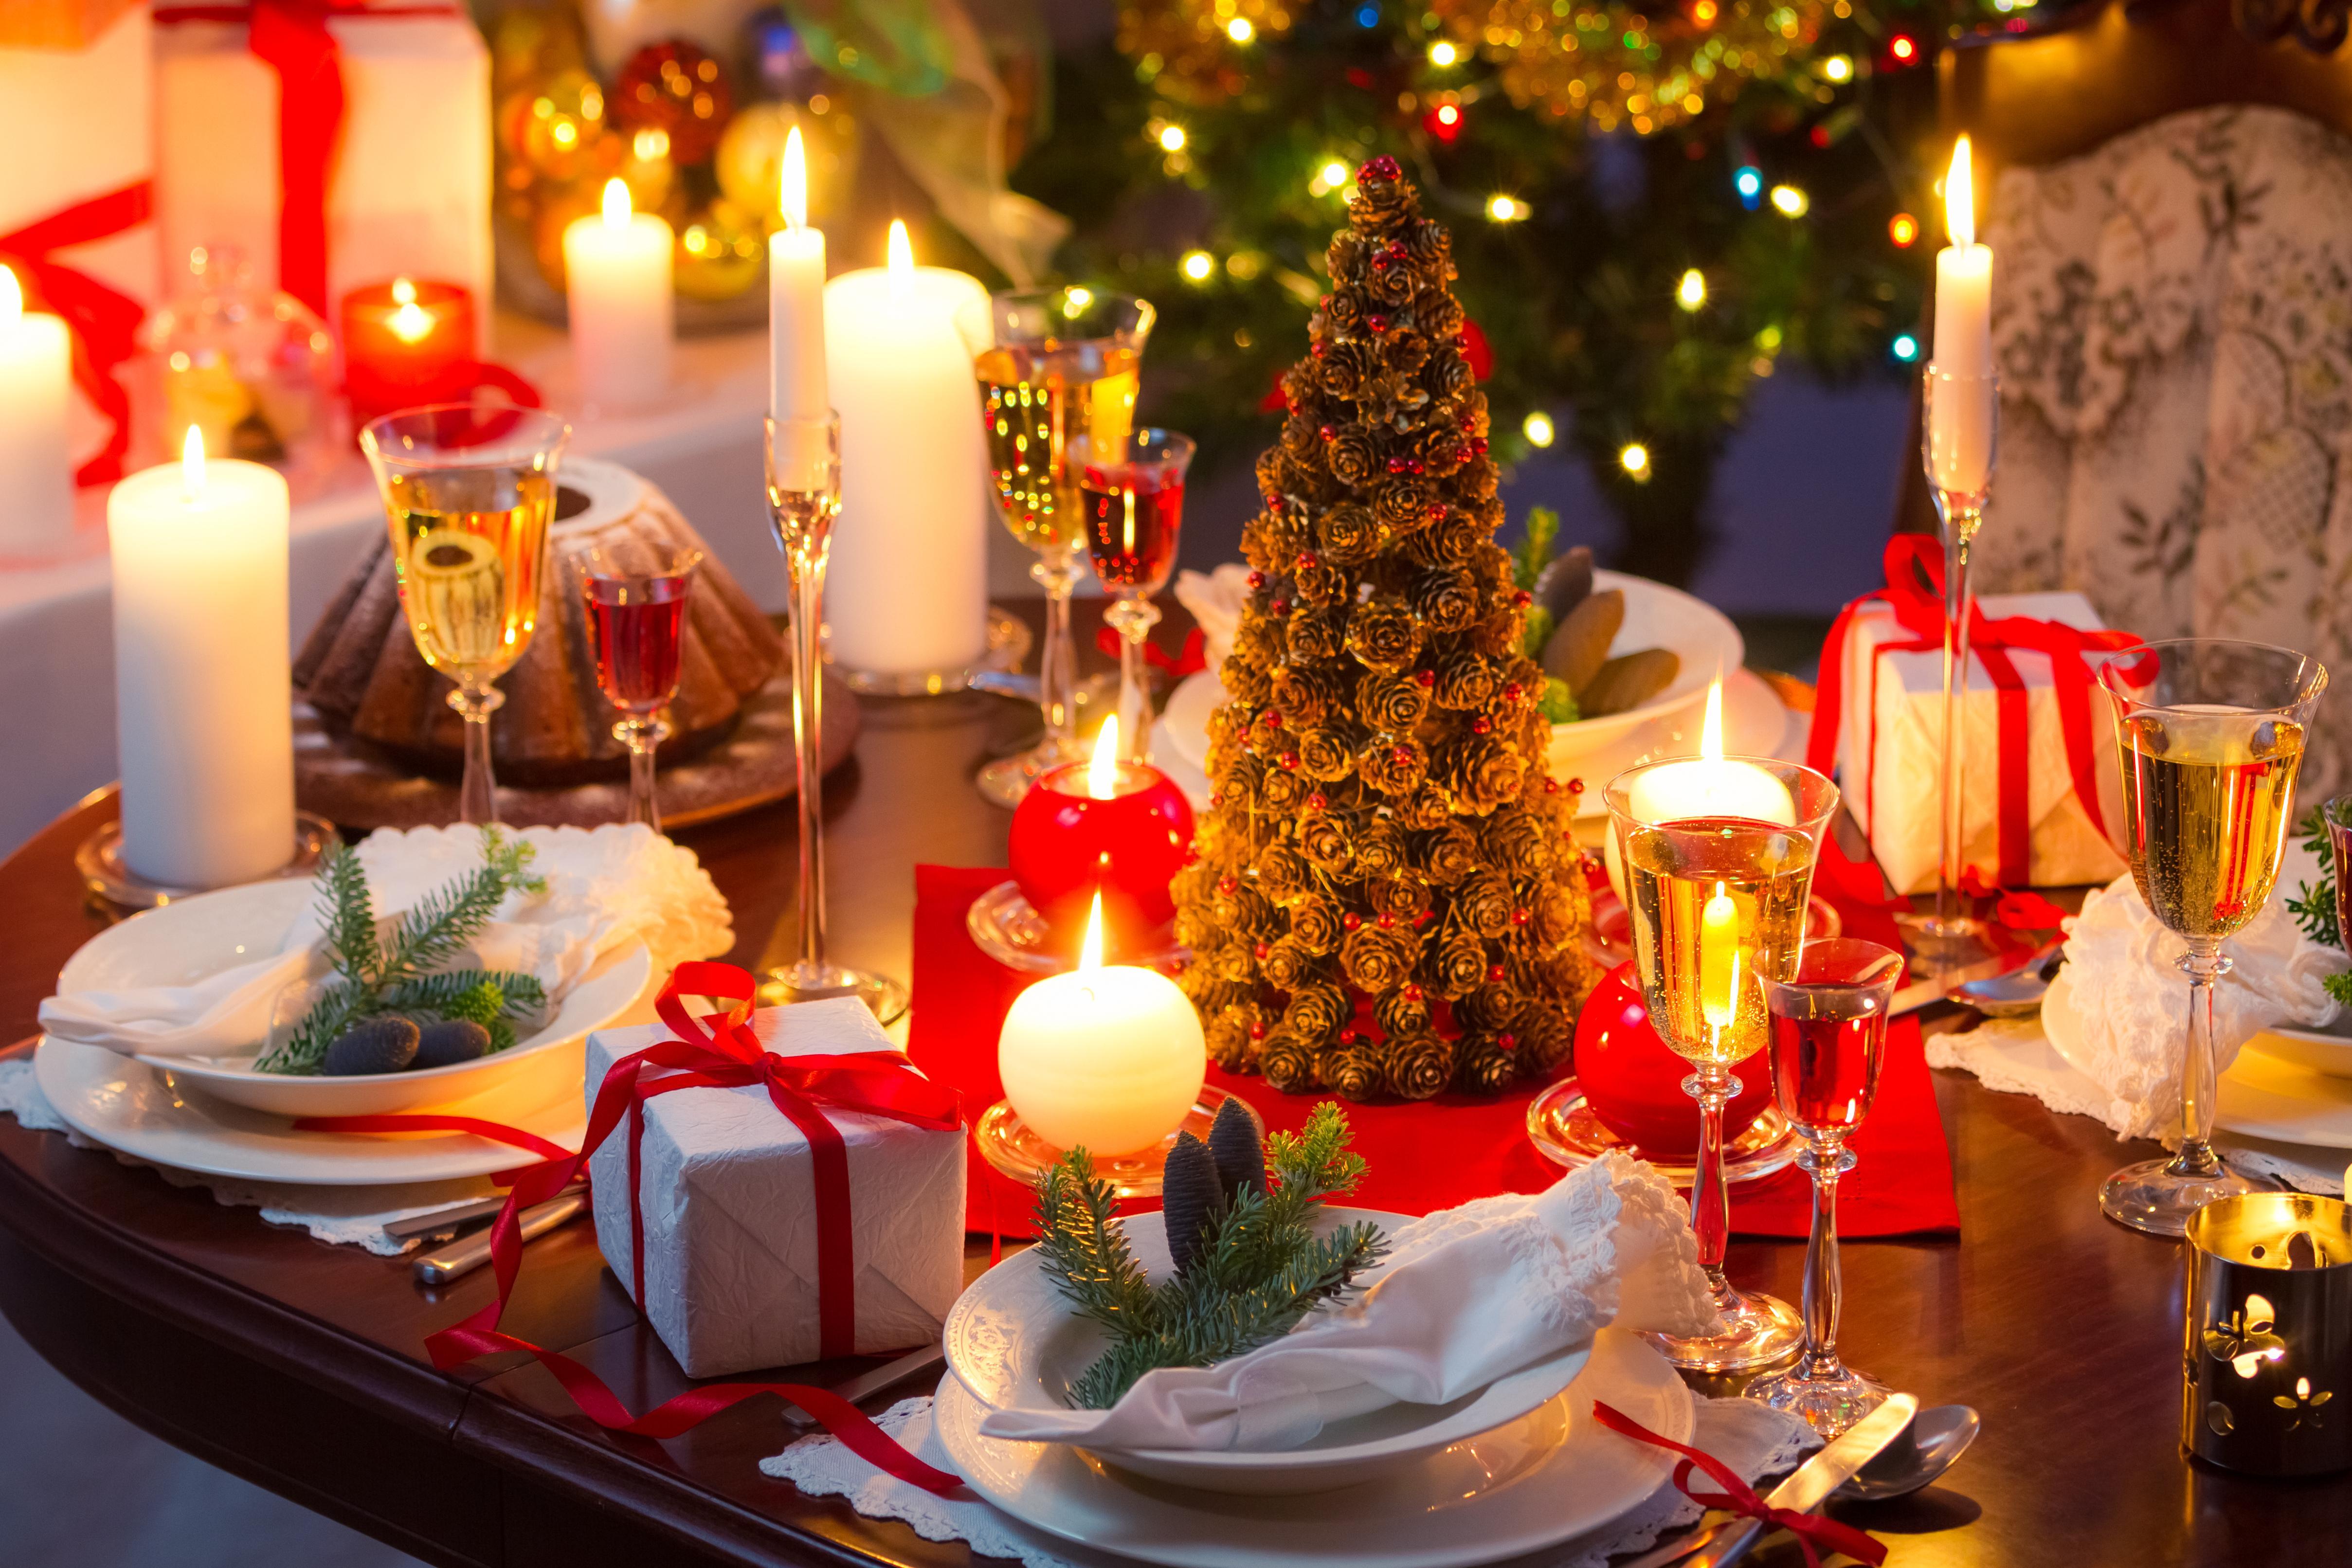 обои новогодний стол, елочка, свечи, подарки картинки фото